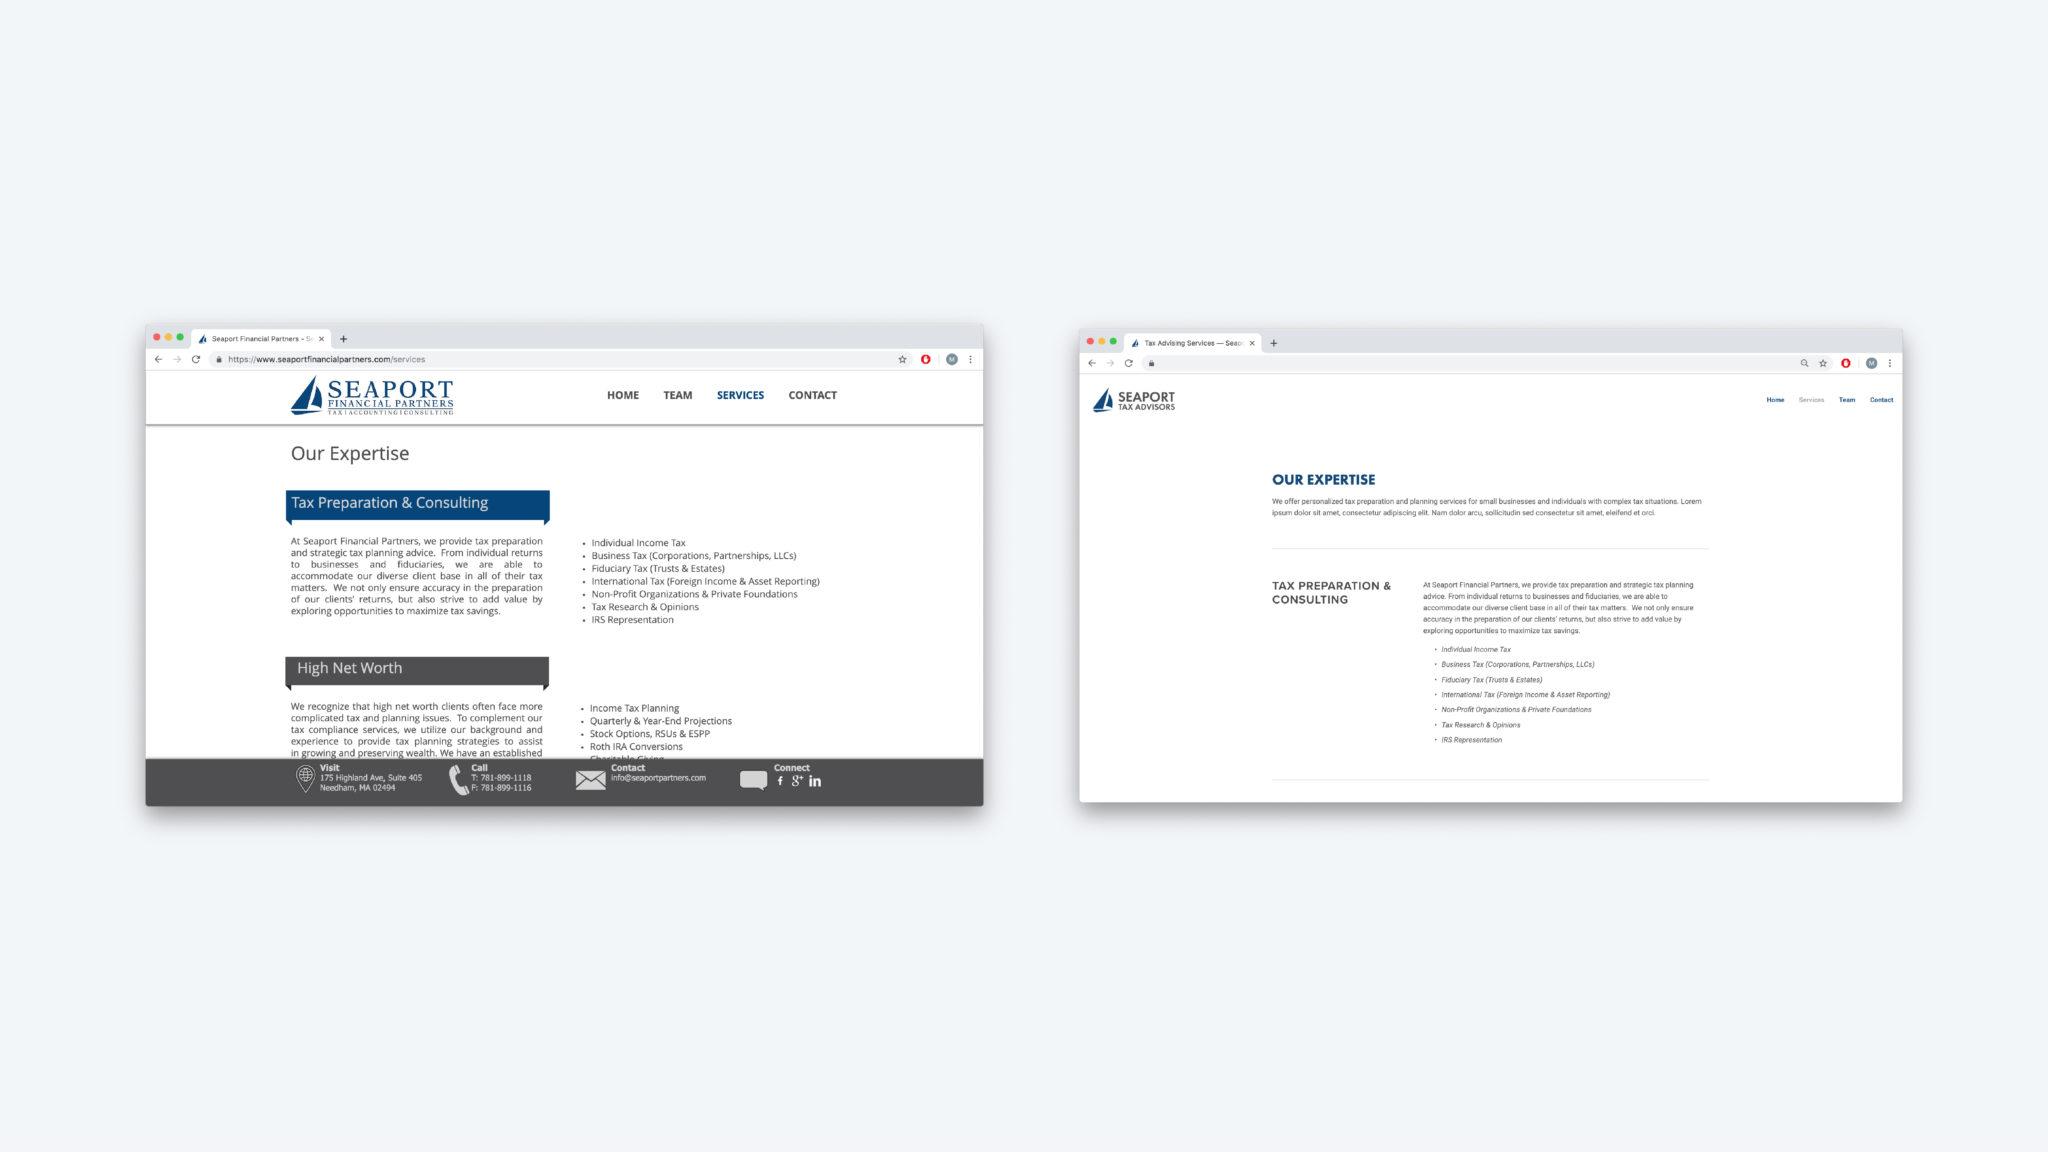 Seaport-Website-BeforeAfter